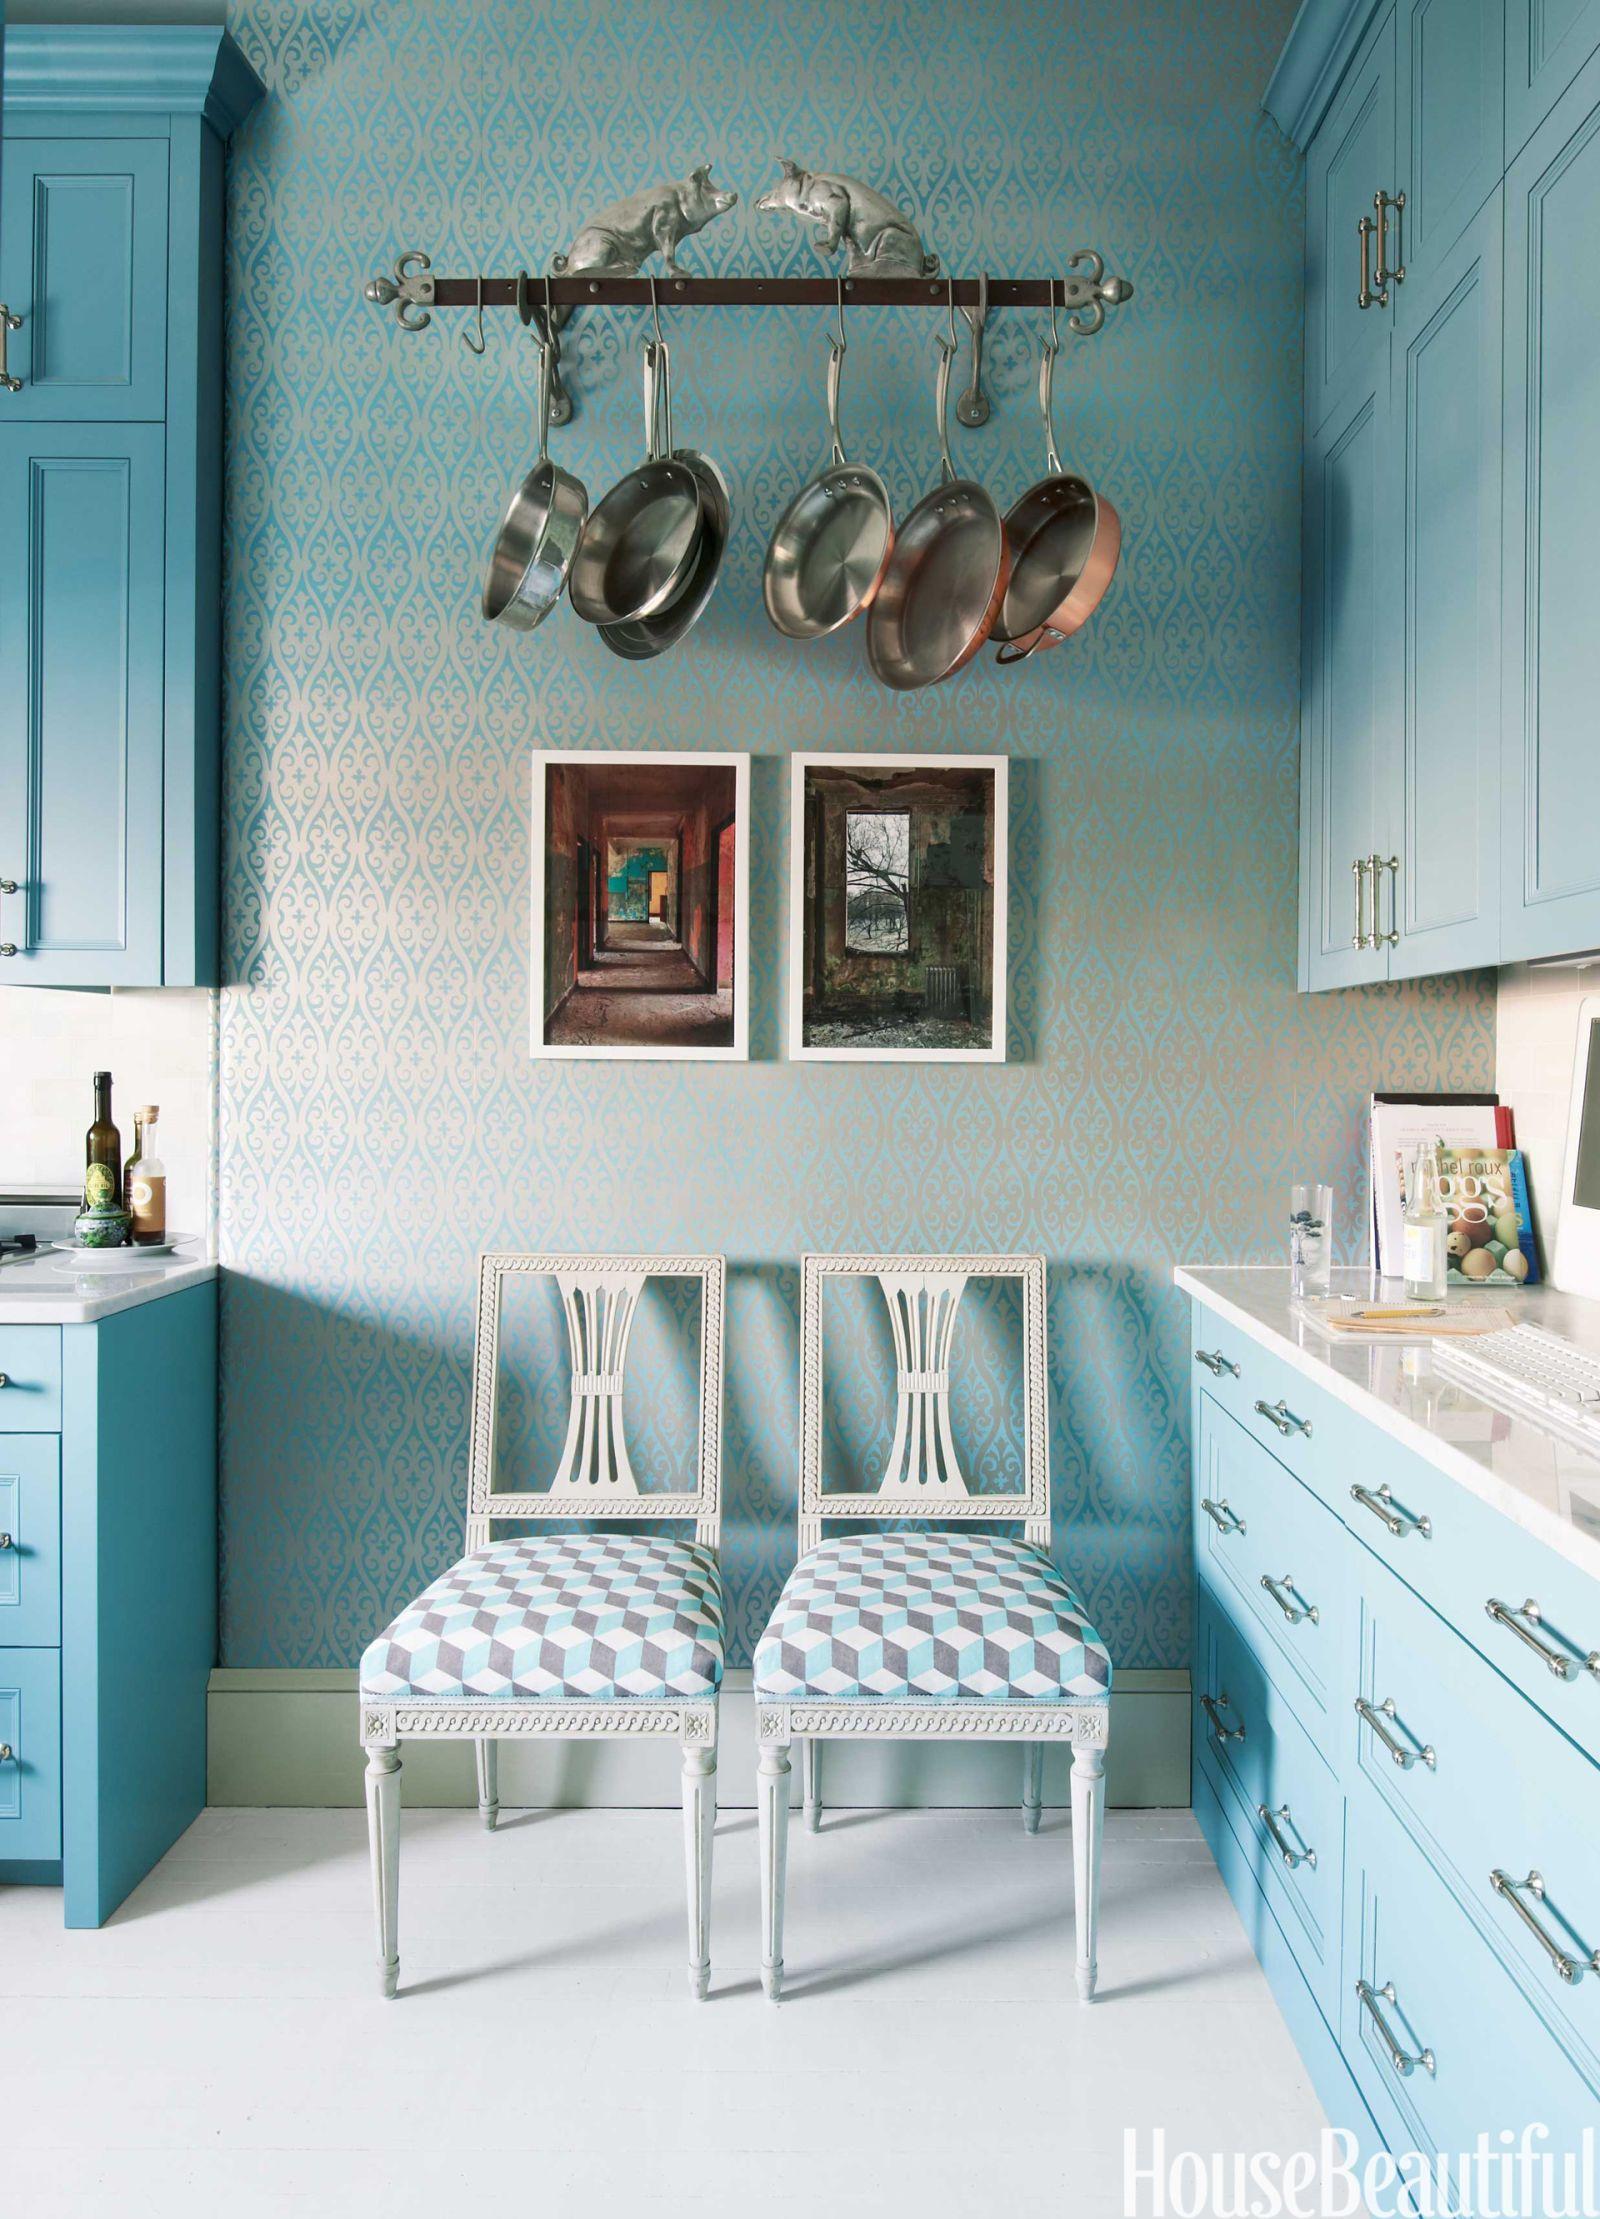 Stylish Ways to Add Kitchen Style - Kitchen Interior Design Ideas ...